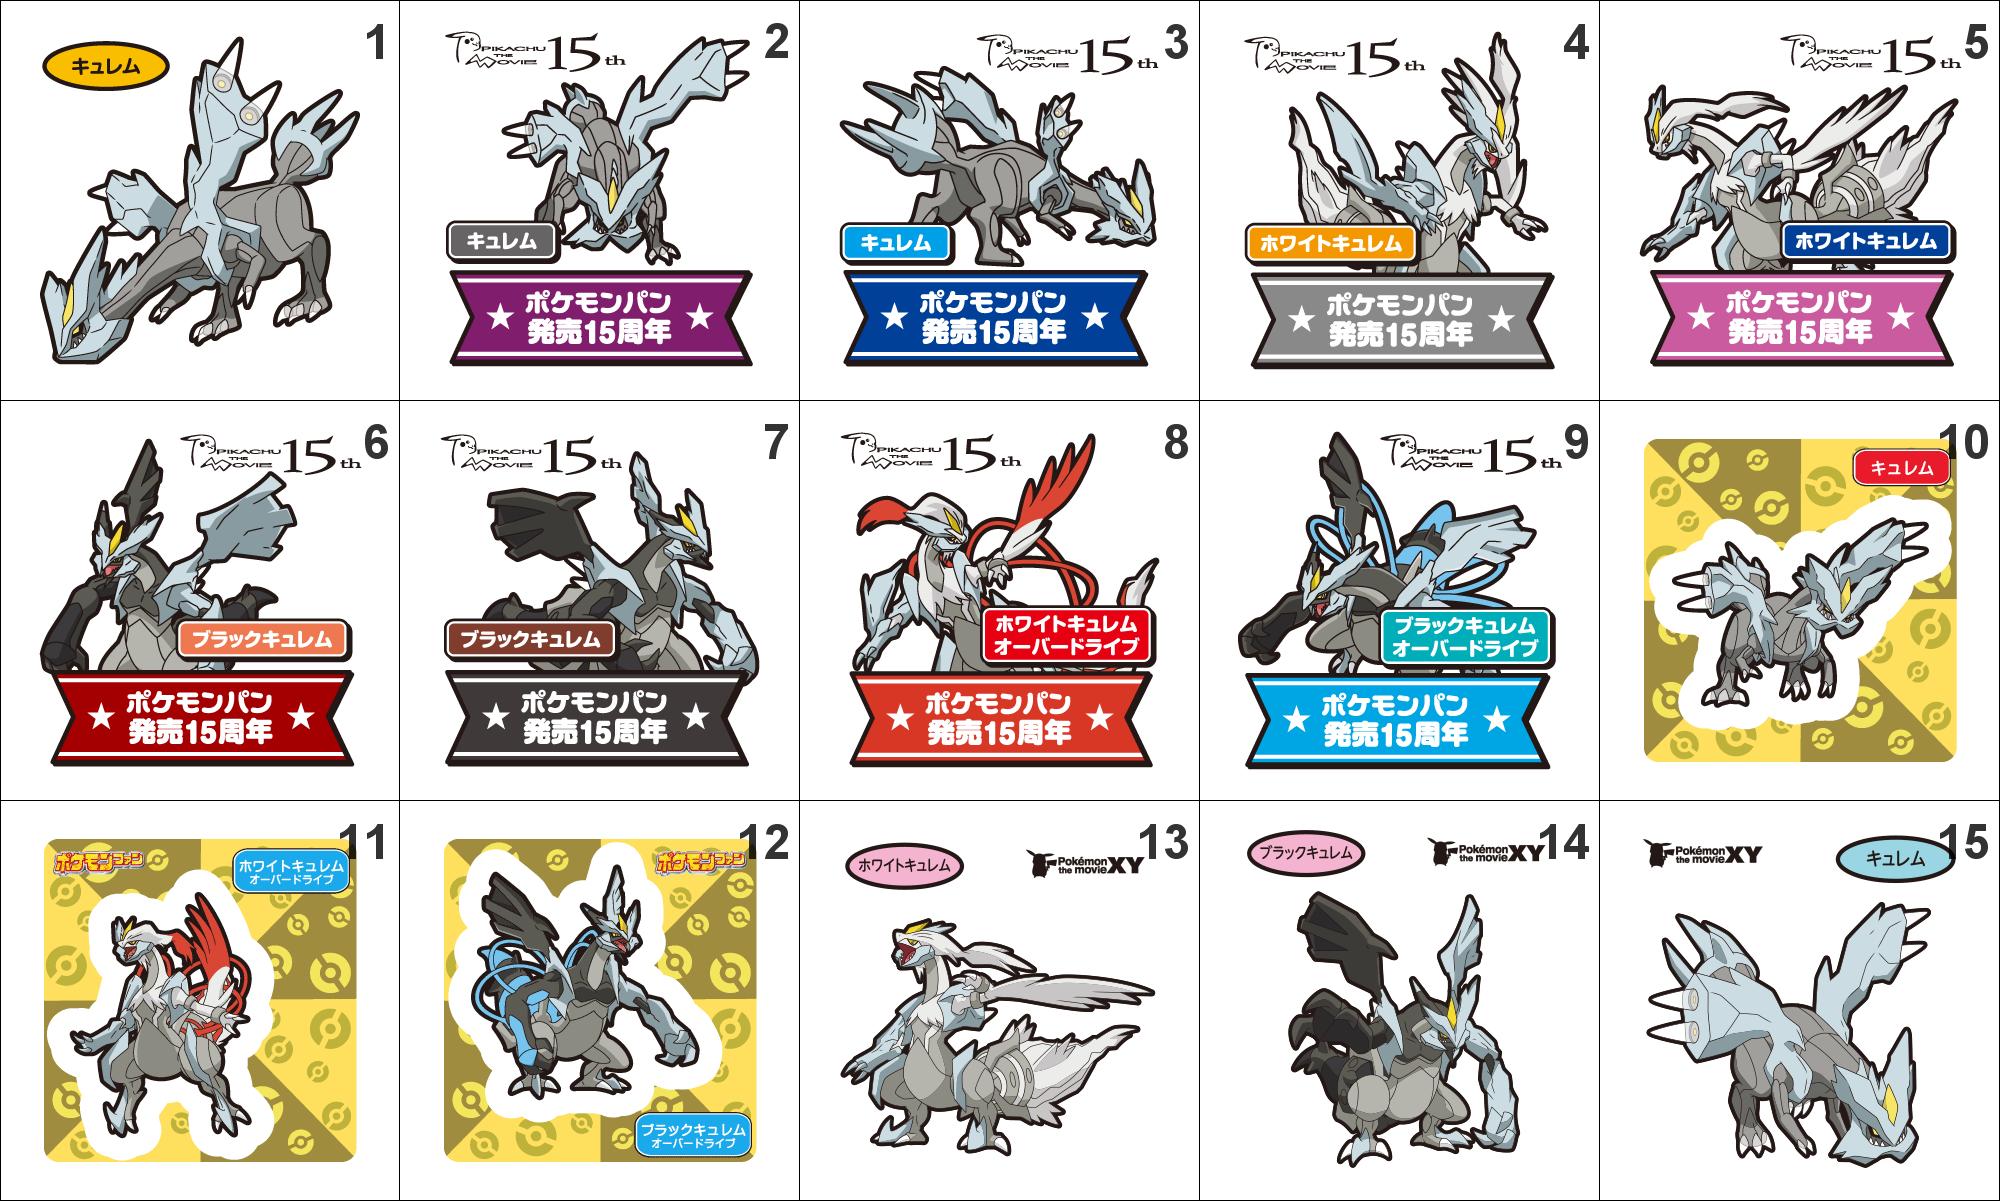 646 kyurem black kyurem white kyurem pan stickers pokemon